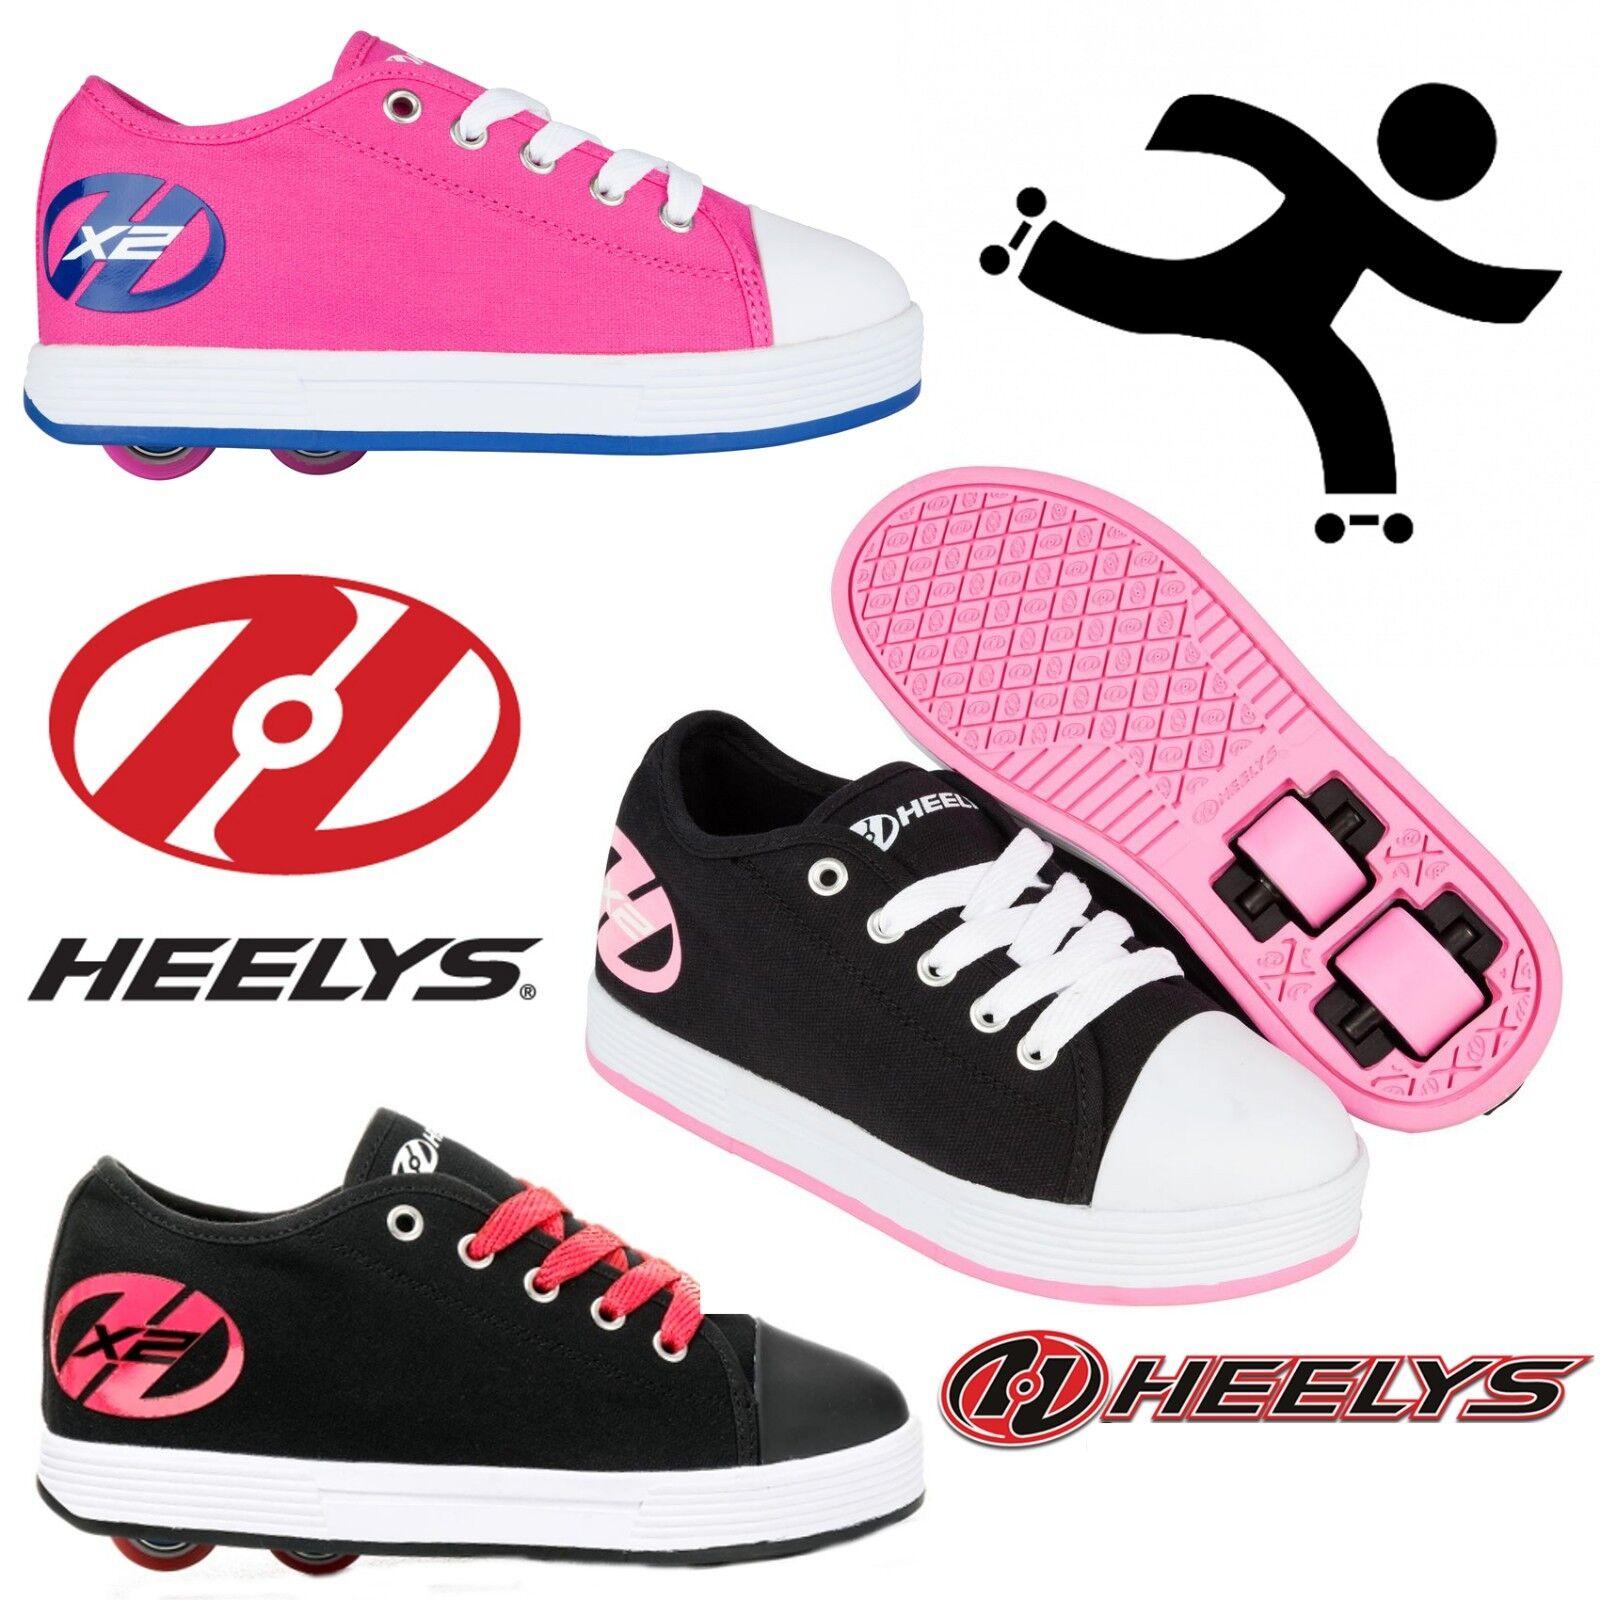 Heelys Kids Pow X2 Tennis Shoe